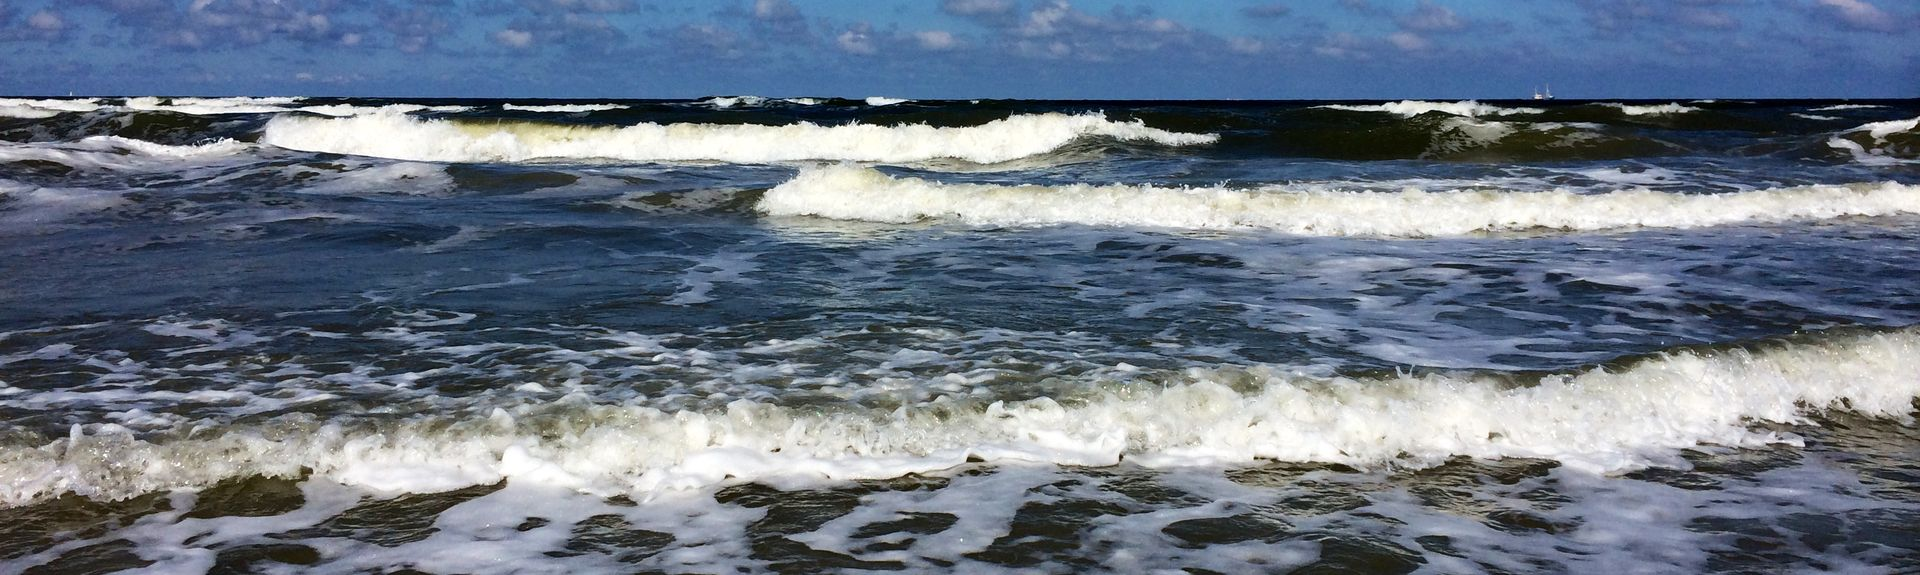 Mar de Frisia, Schleswig-Holstein, Alemania